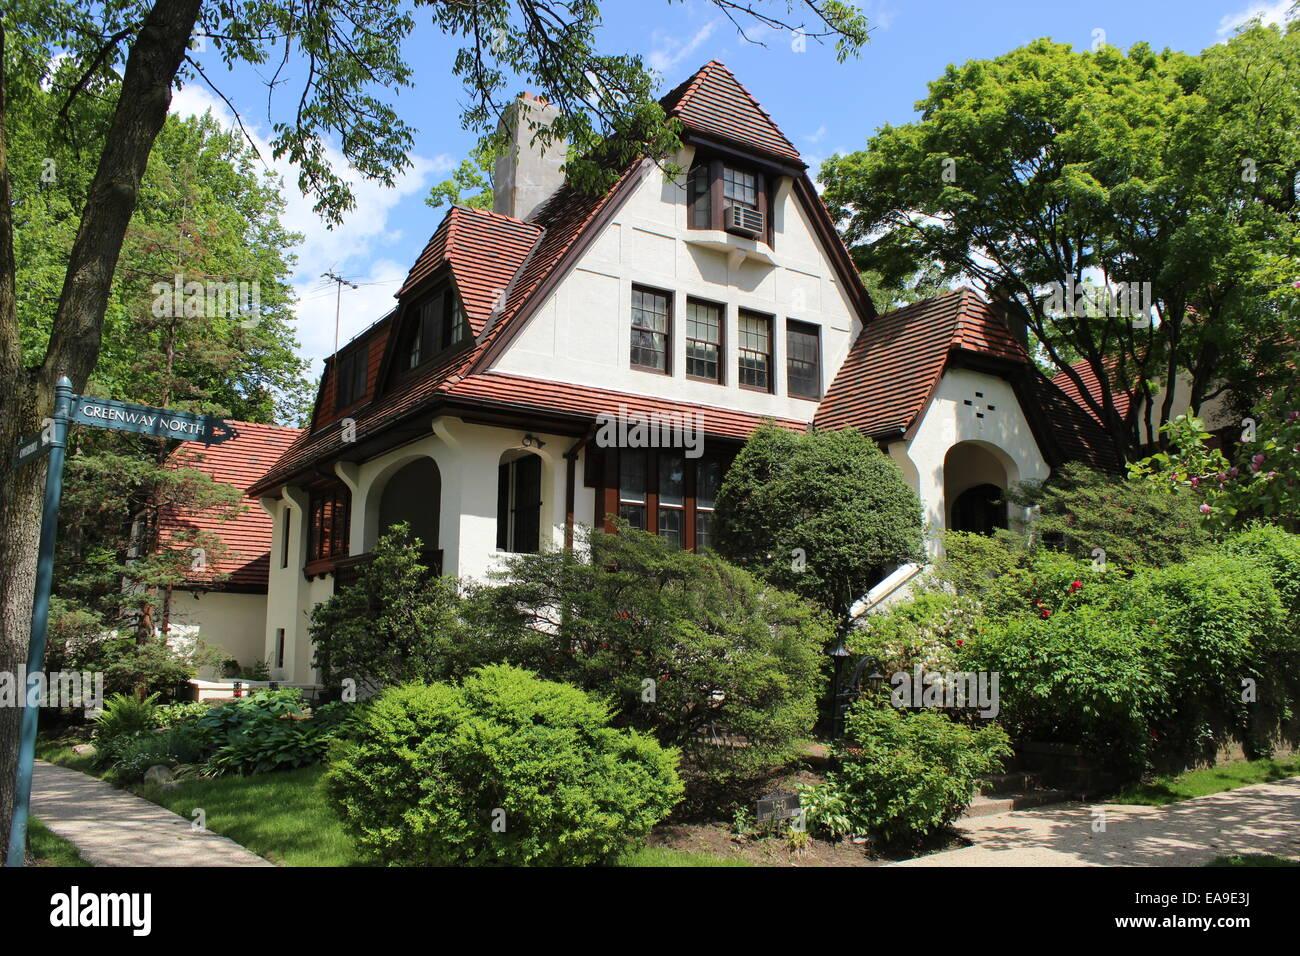 Superb Tudor Revival House, Forest Hills Gardens, Queens, New York   Stock Image